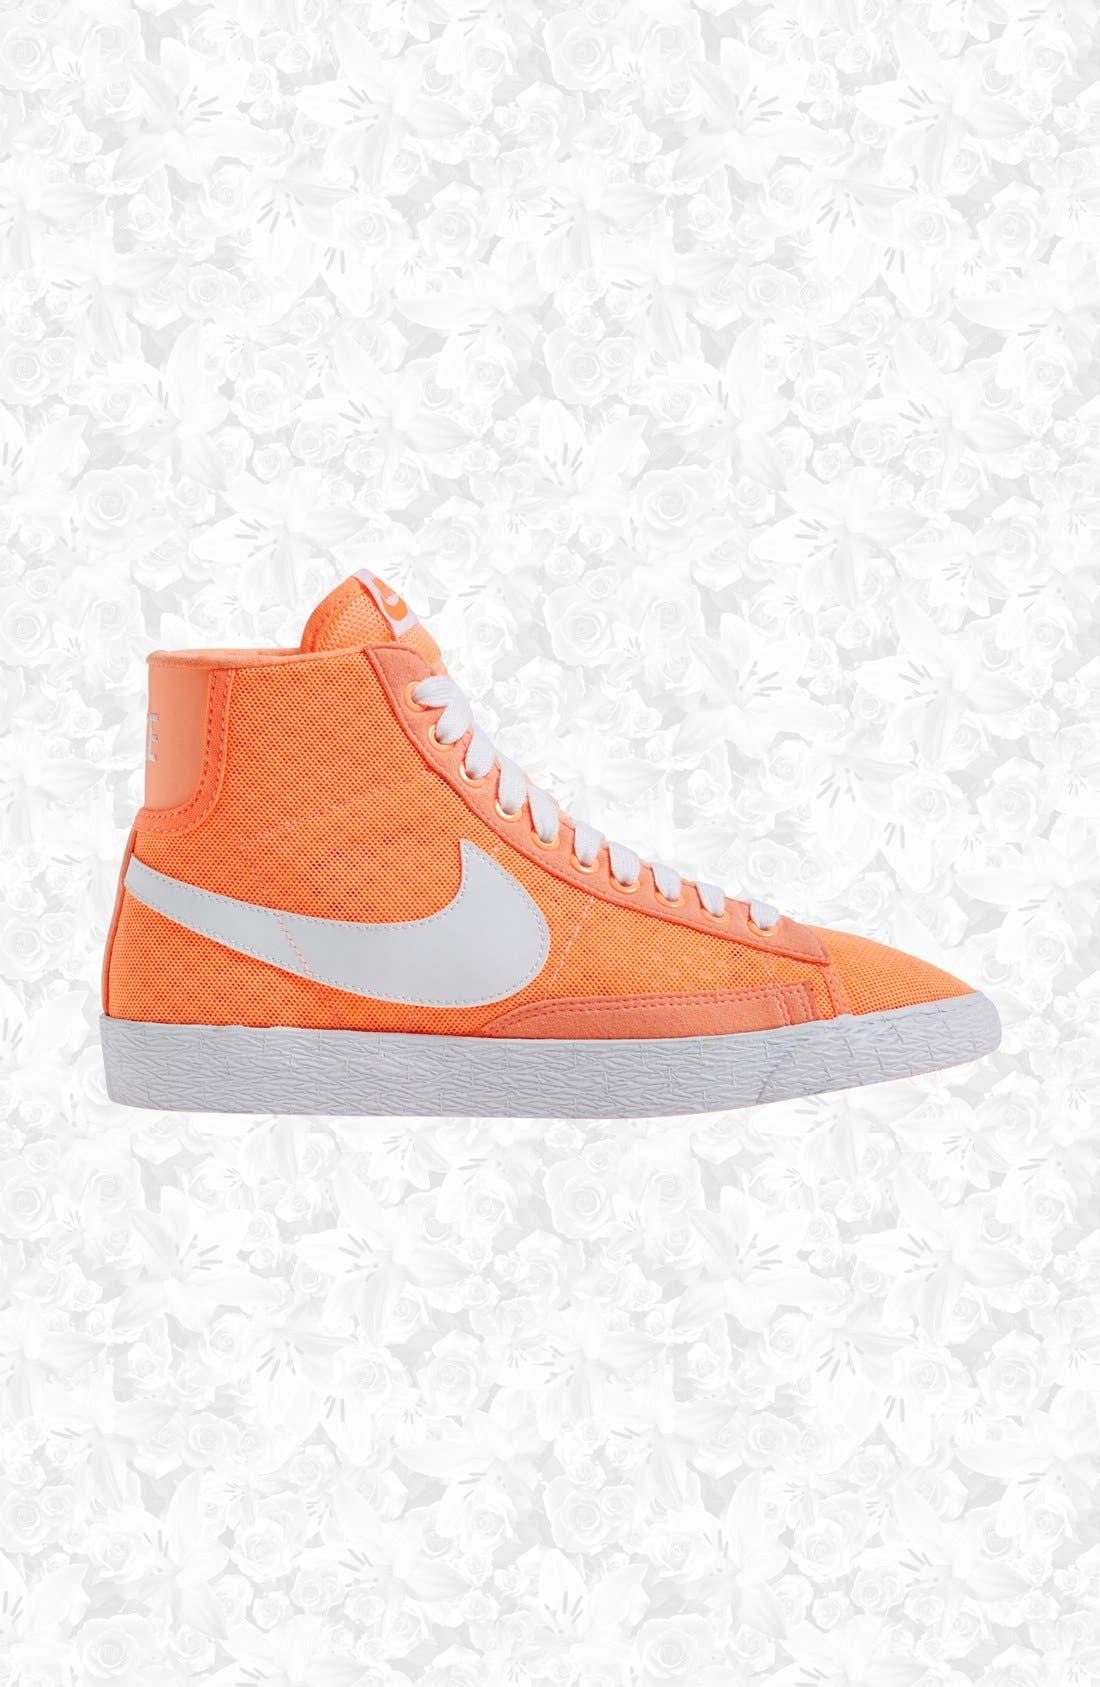 Alternate Image 1 Selected - Nike 'Blazer' Vintage High Top Mesh Sneaker (Women)